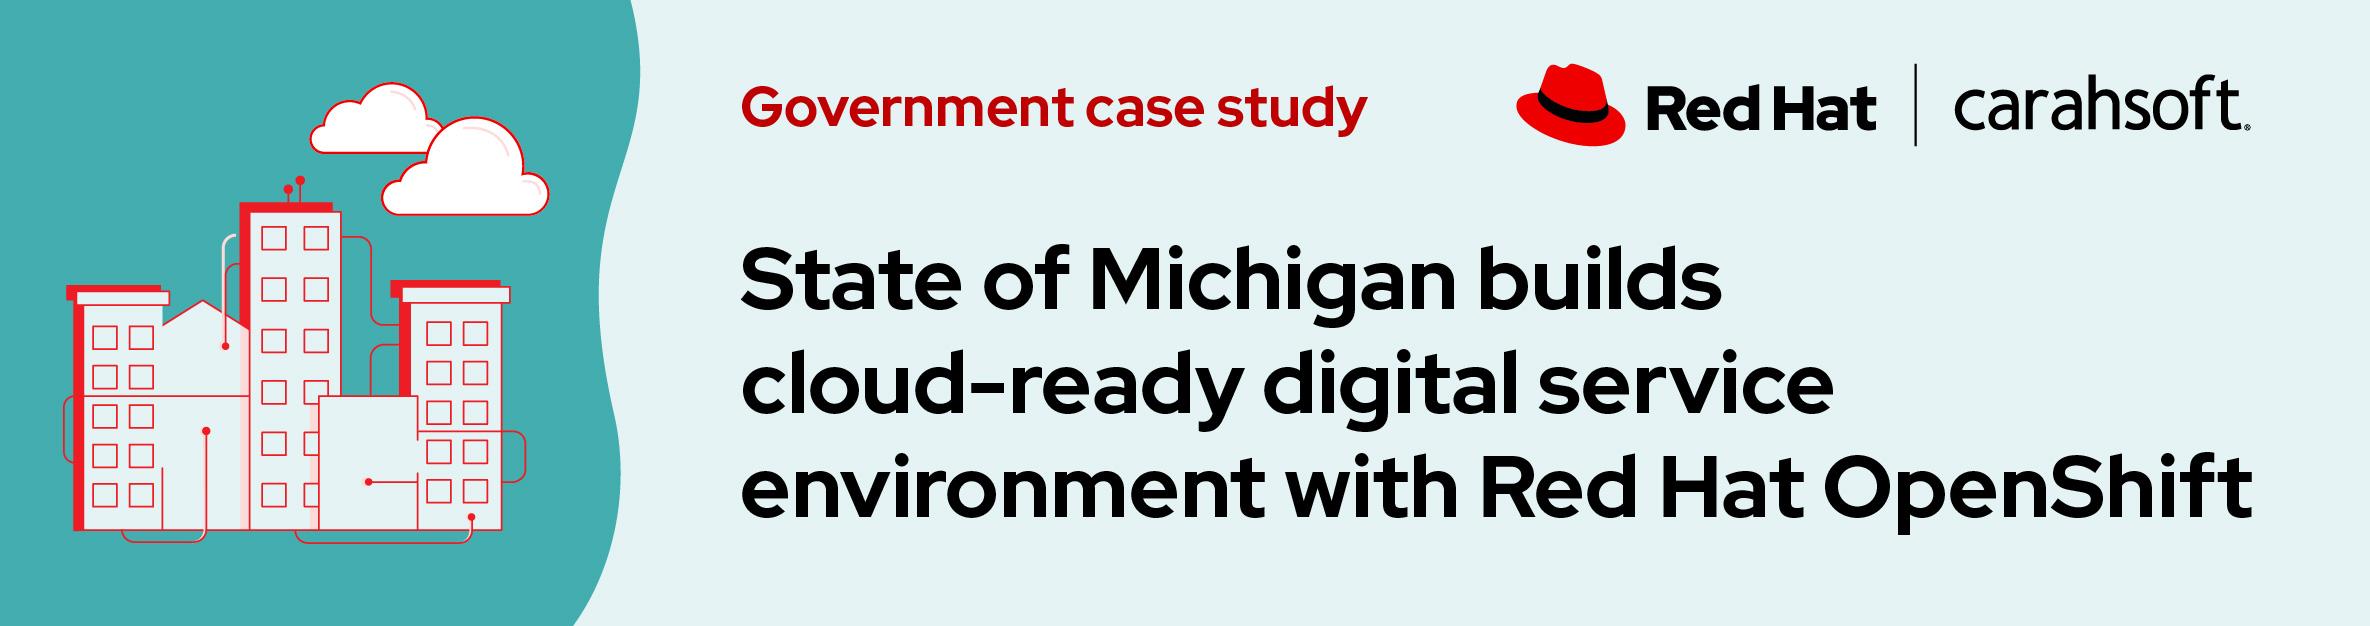 RH Case Study-Michigan_LP Banner.jpg